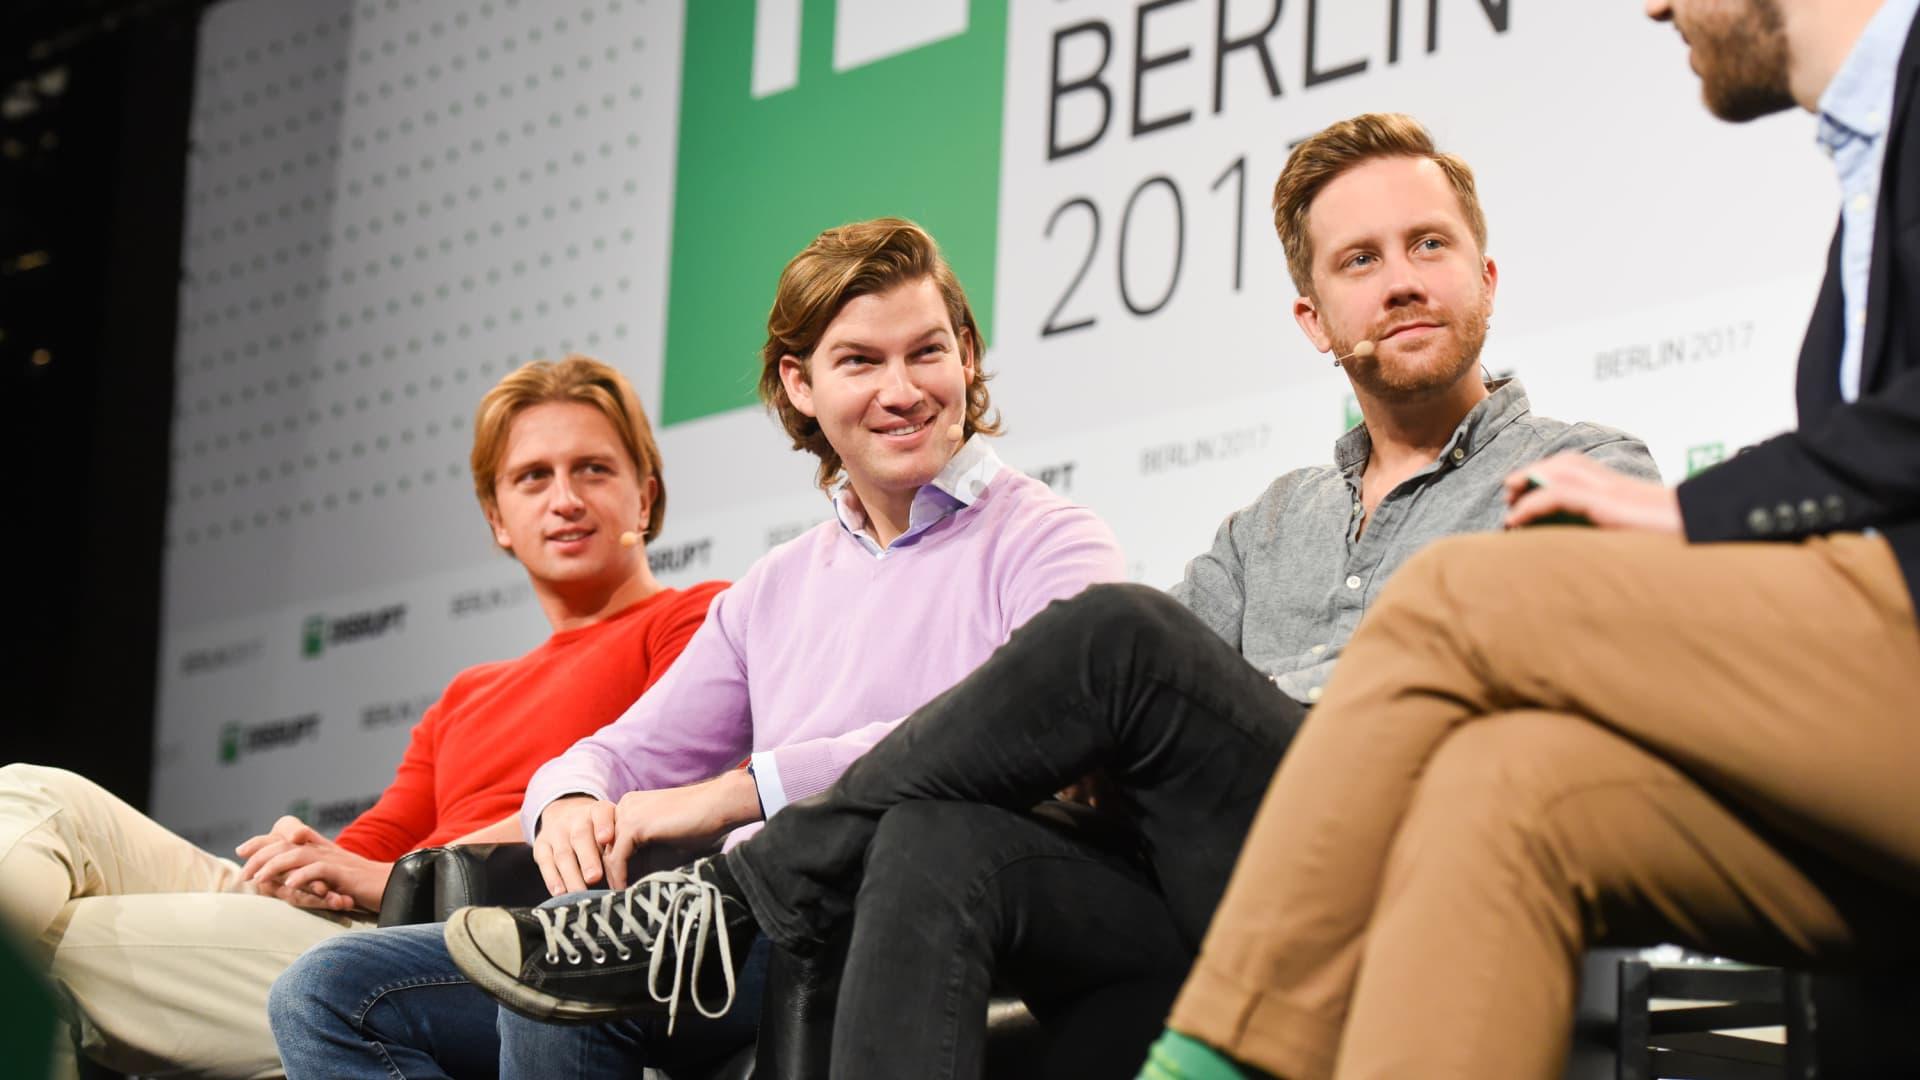 Revolut CEO Nikolay Storonsky, N26 CEO Valentin Stalf and Monzo CEO Tom Blomfield talk at TechCrunch Disrupt Berlin 2017.